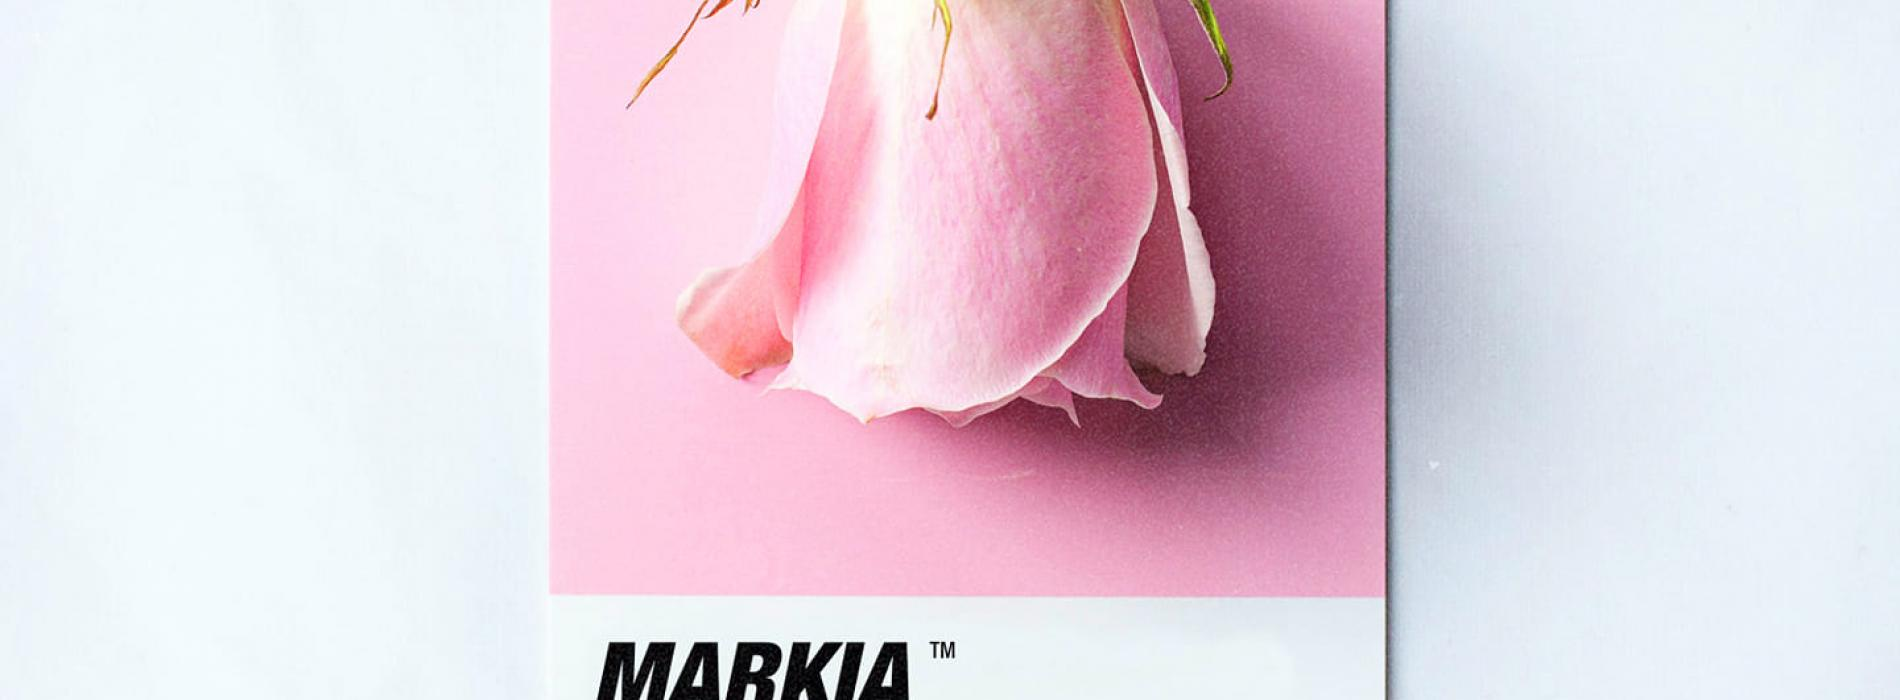 New Music : Markia – Candy